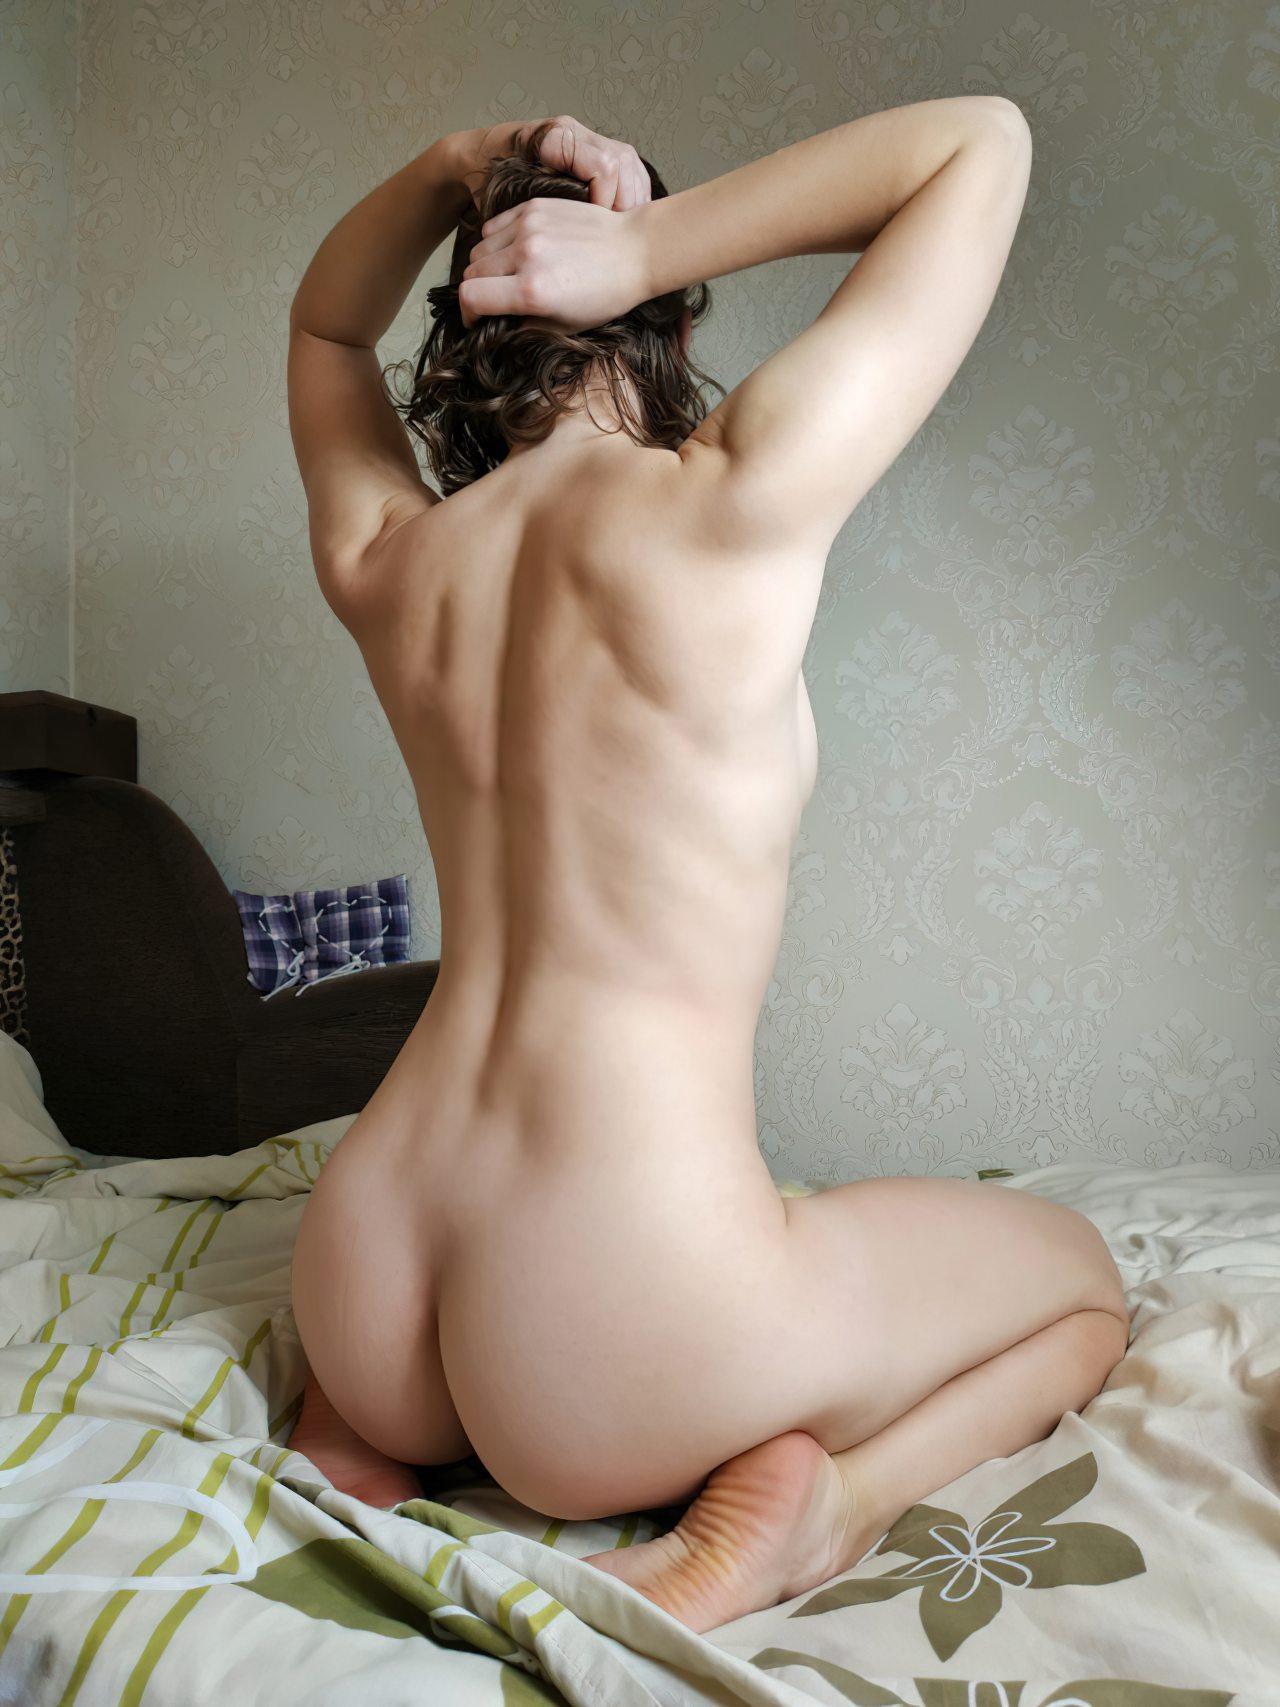 Amadora Belo Corpo Natural (5)